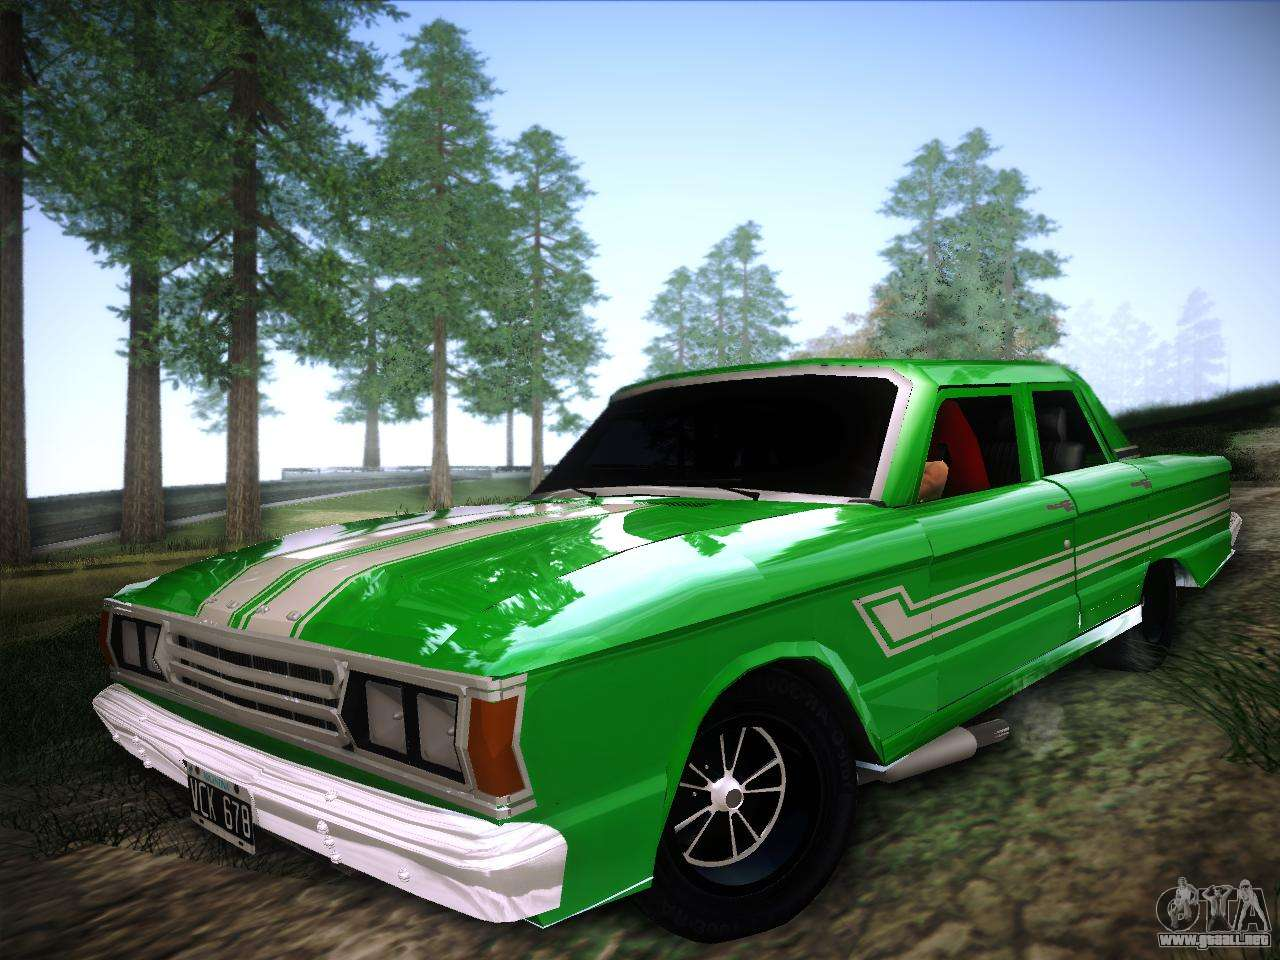 34726 Ford Falcon Sprint